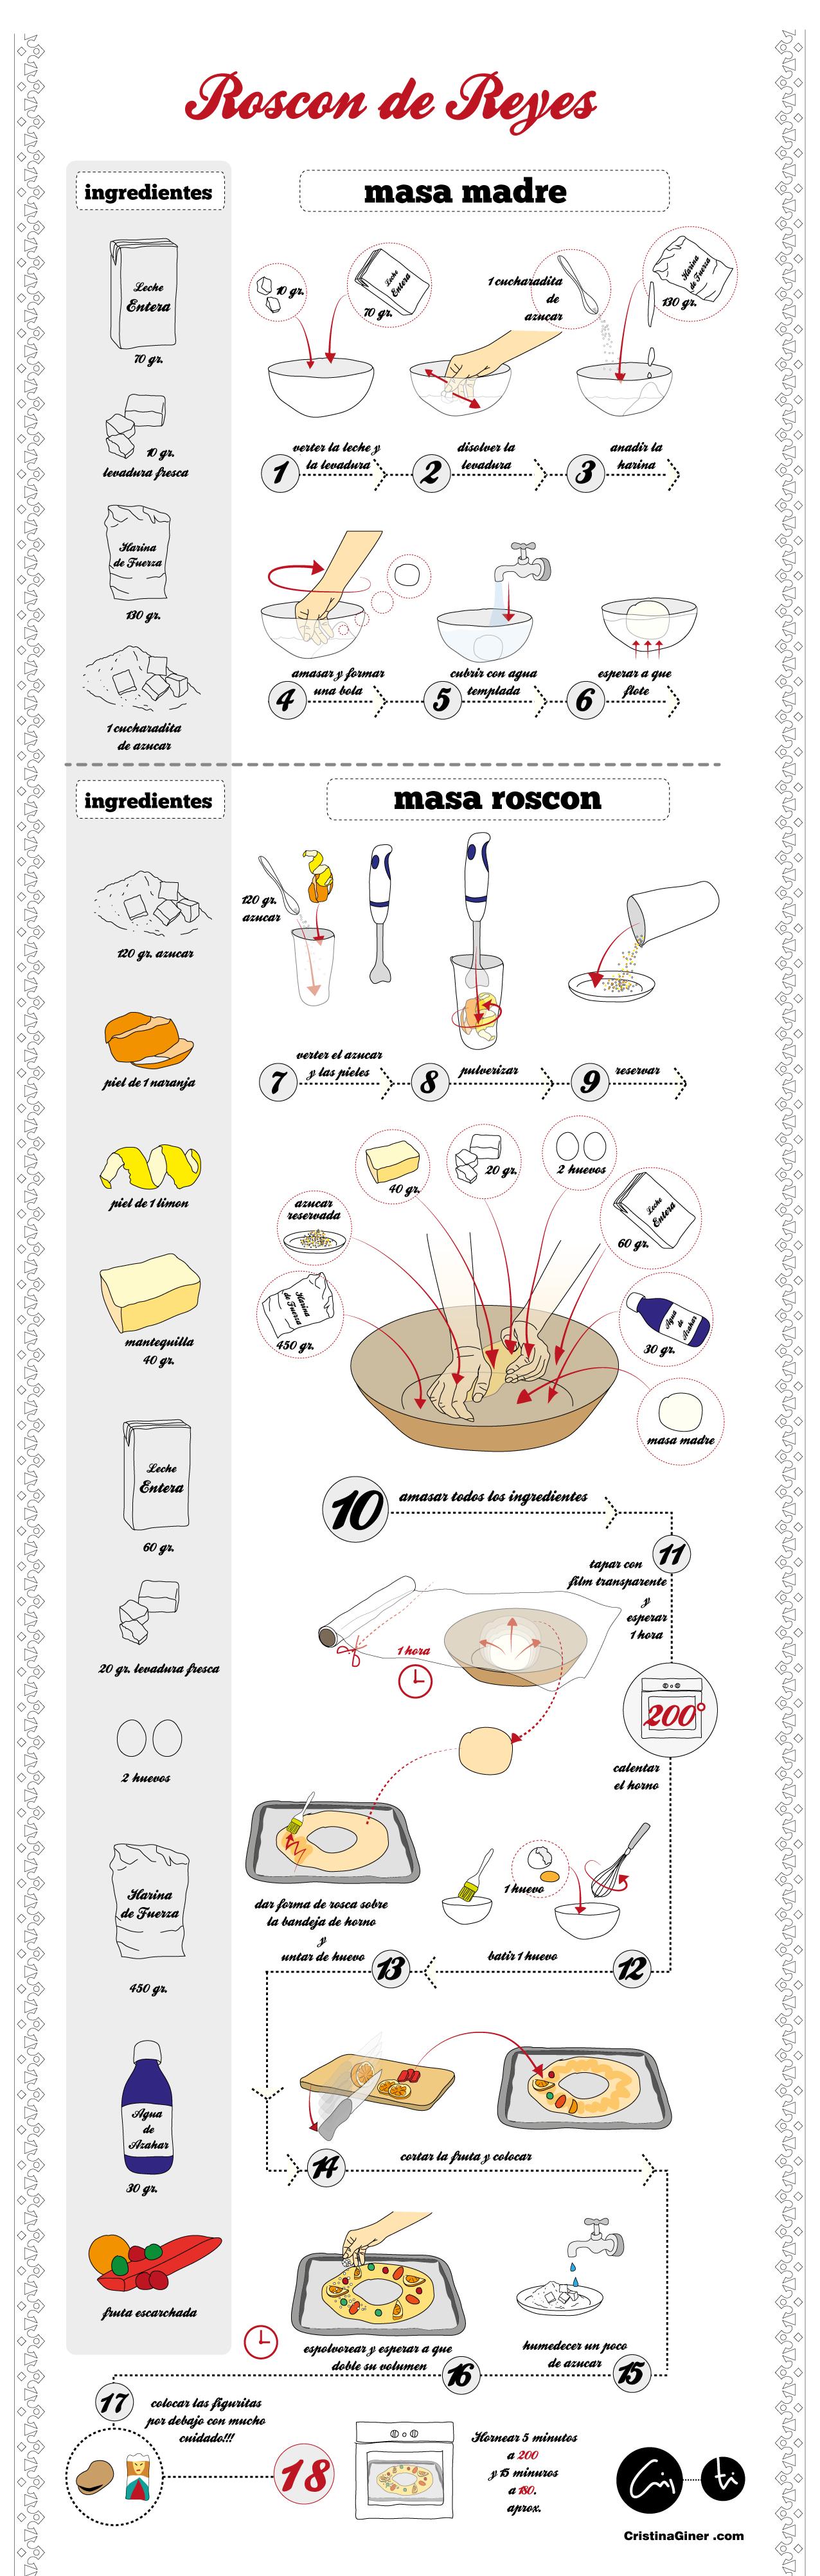 roscon-reyes-infografia